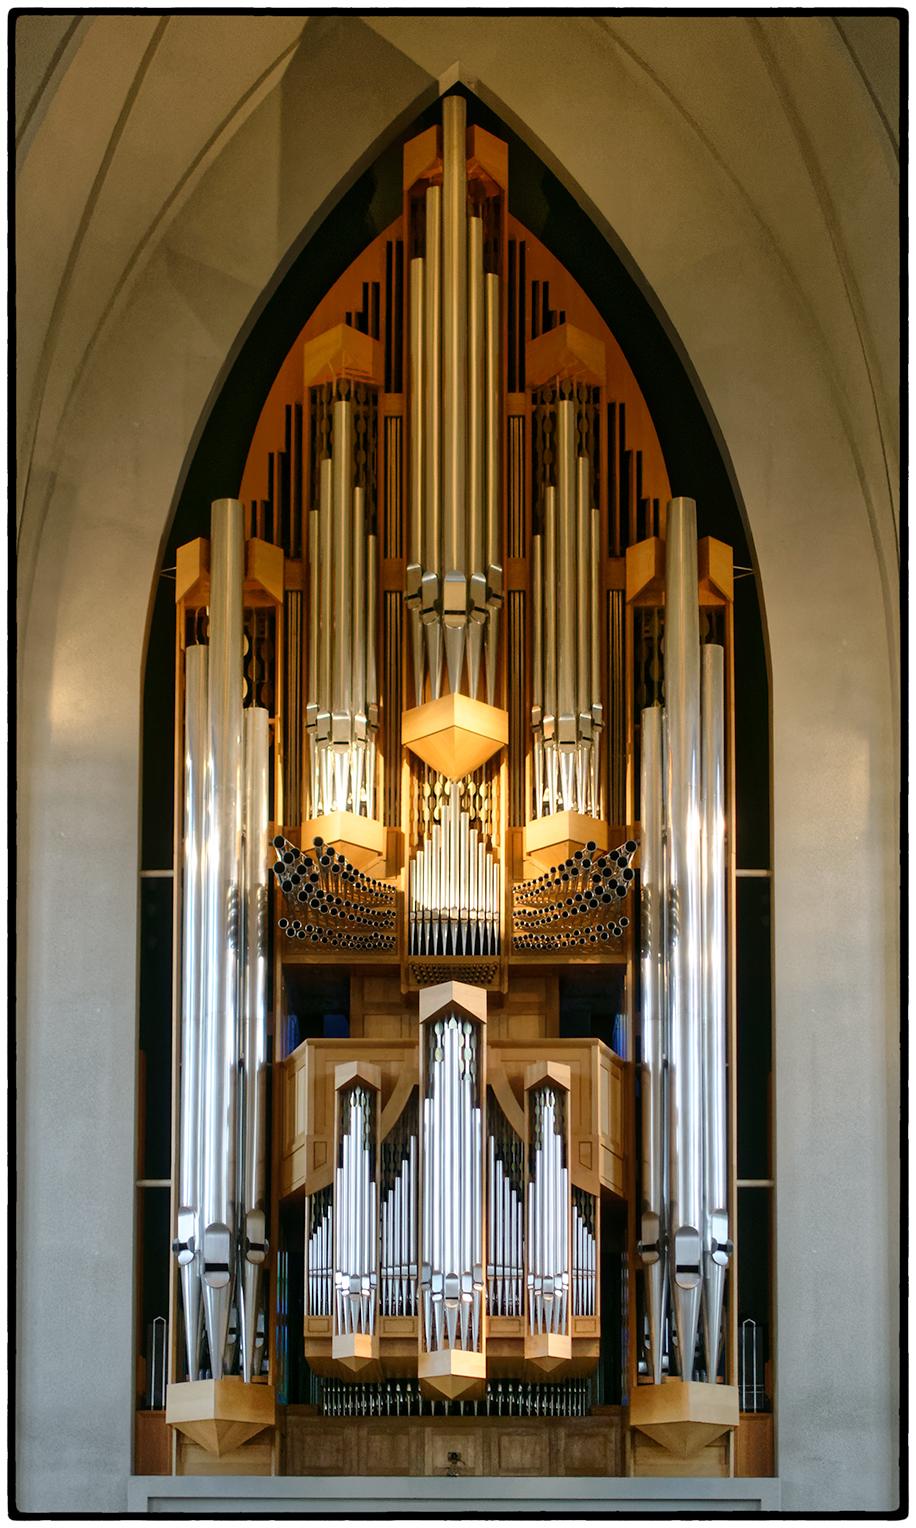 Pipe Organ at Hallgrimskirkja, a Lutheran Church